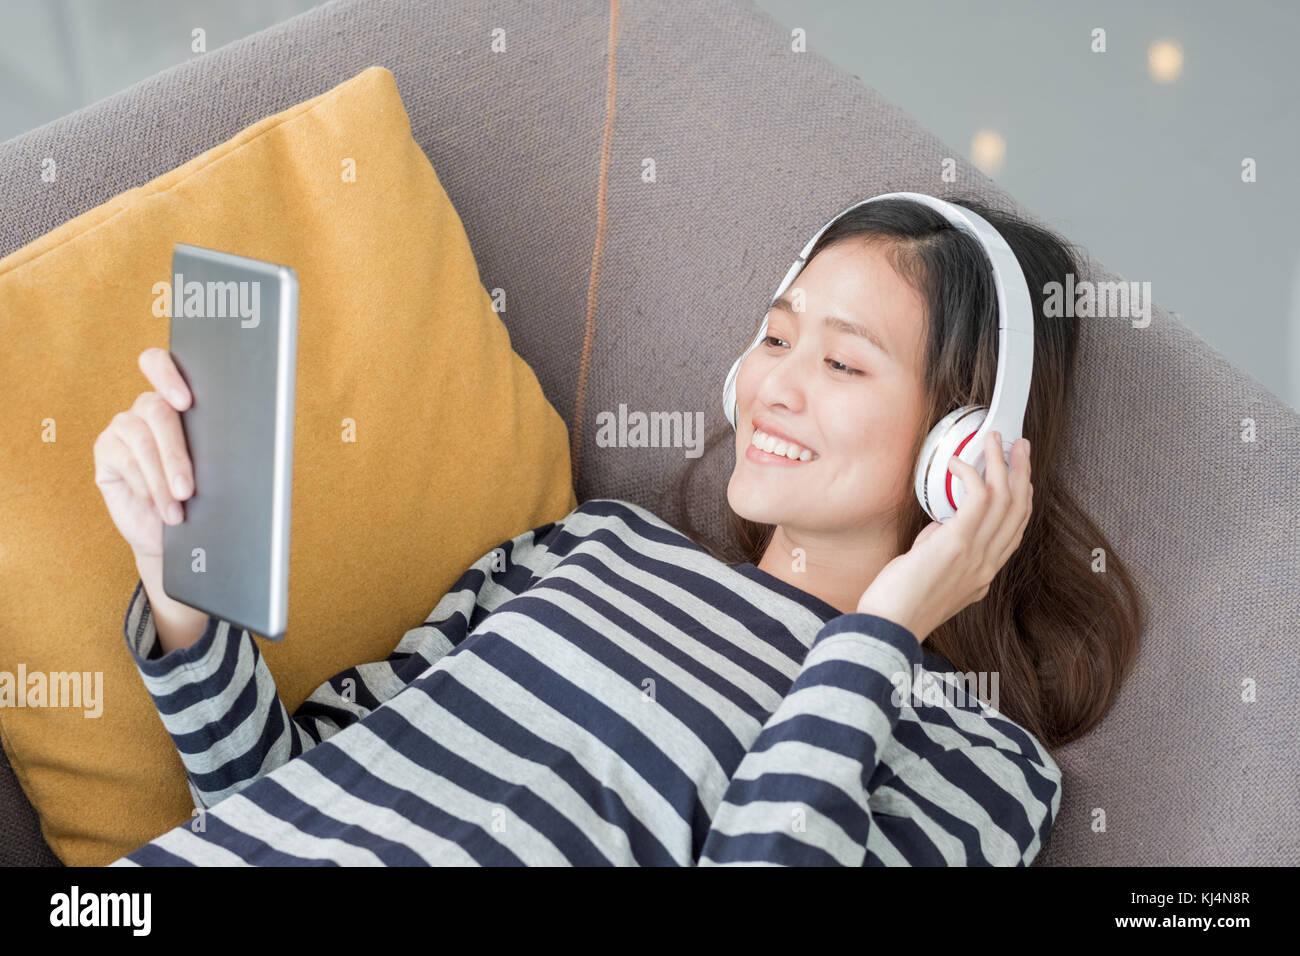 Asian Teenager Girl Wear Headphone Listening Music Play With